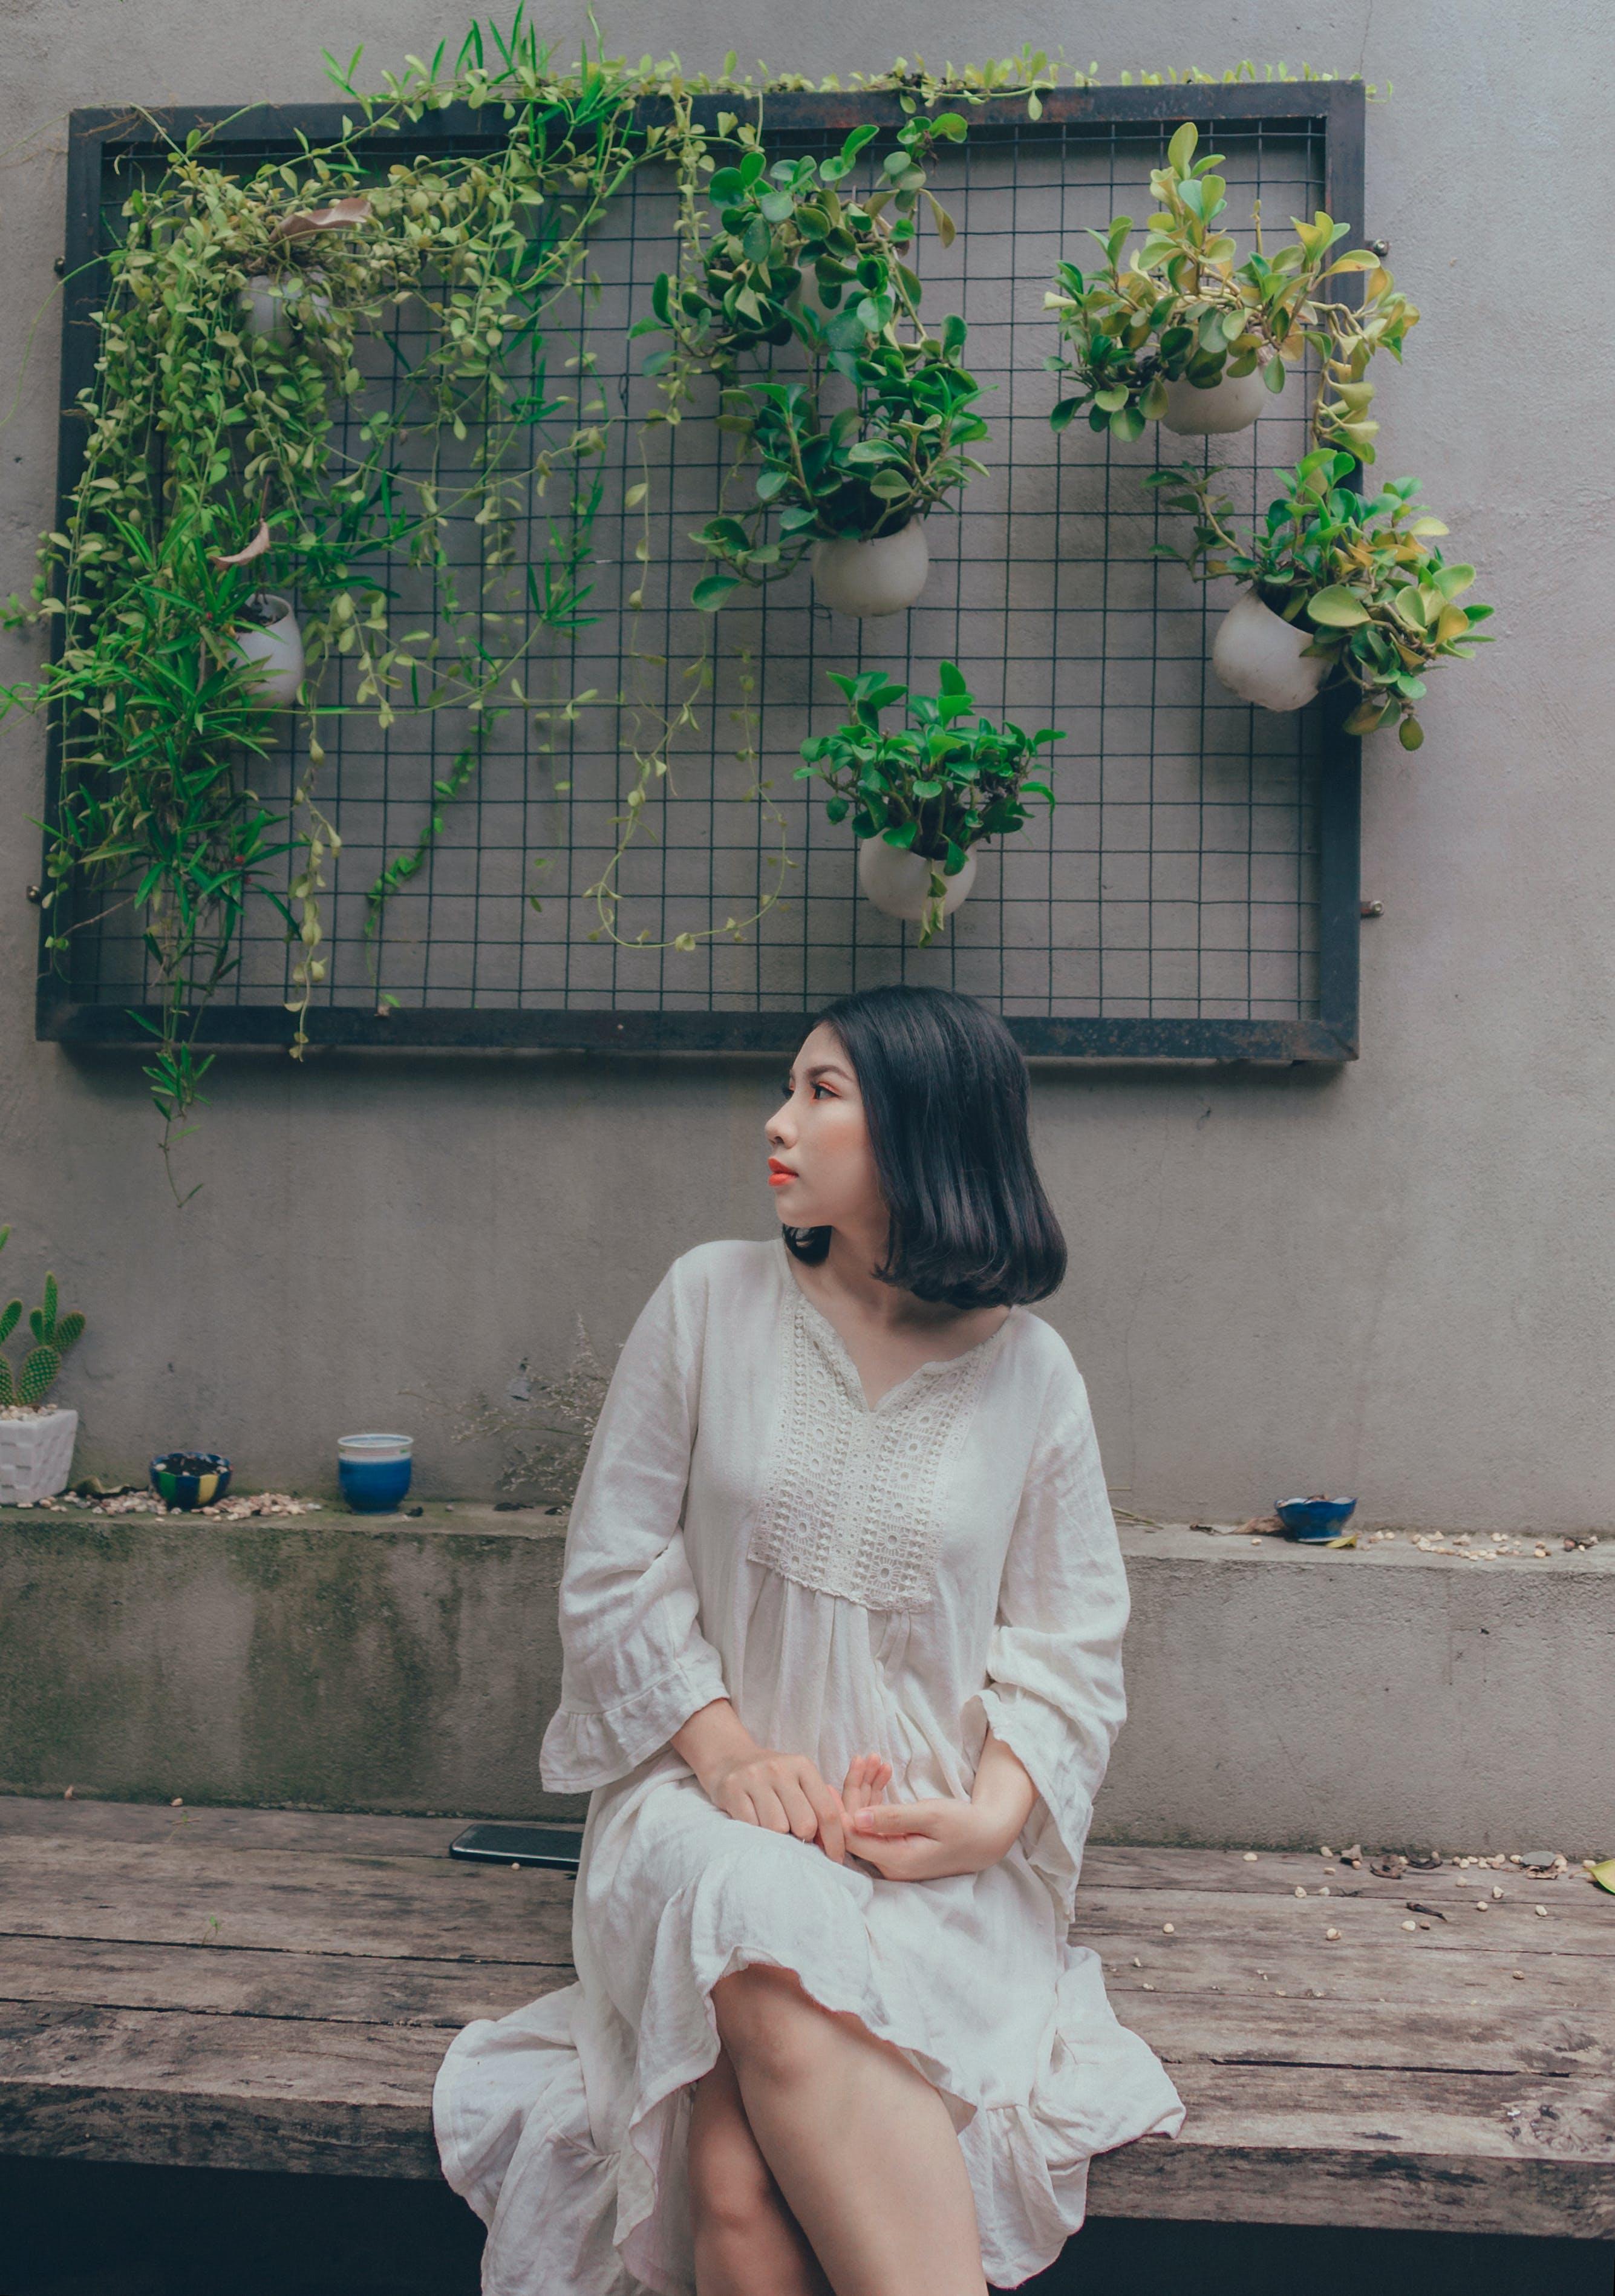 Woman In White V-neck Long-sleeved Dress Sitting On Bench